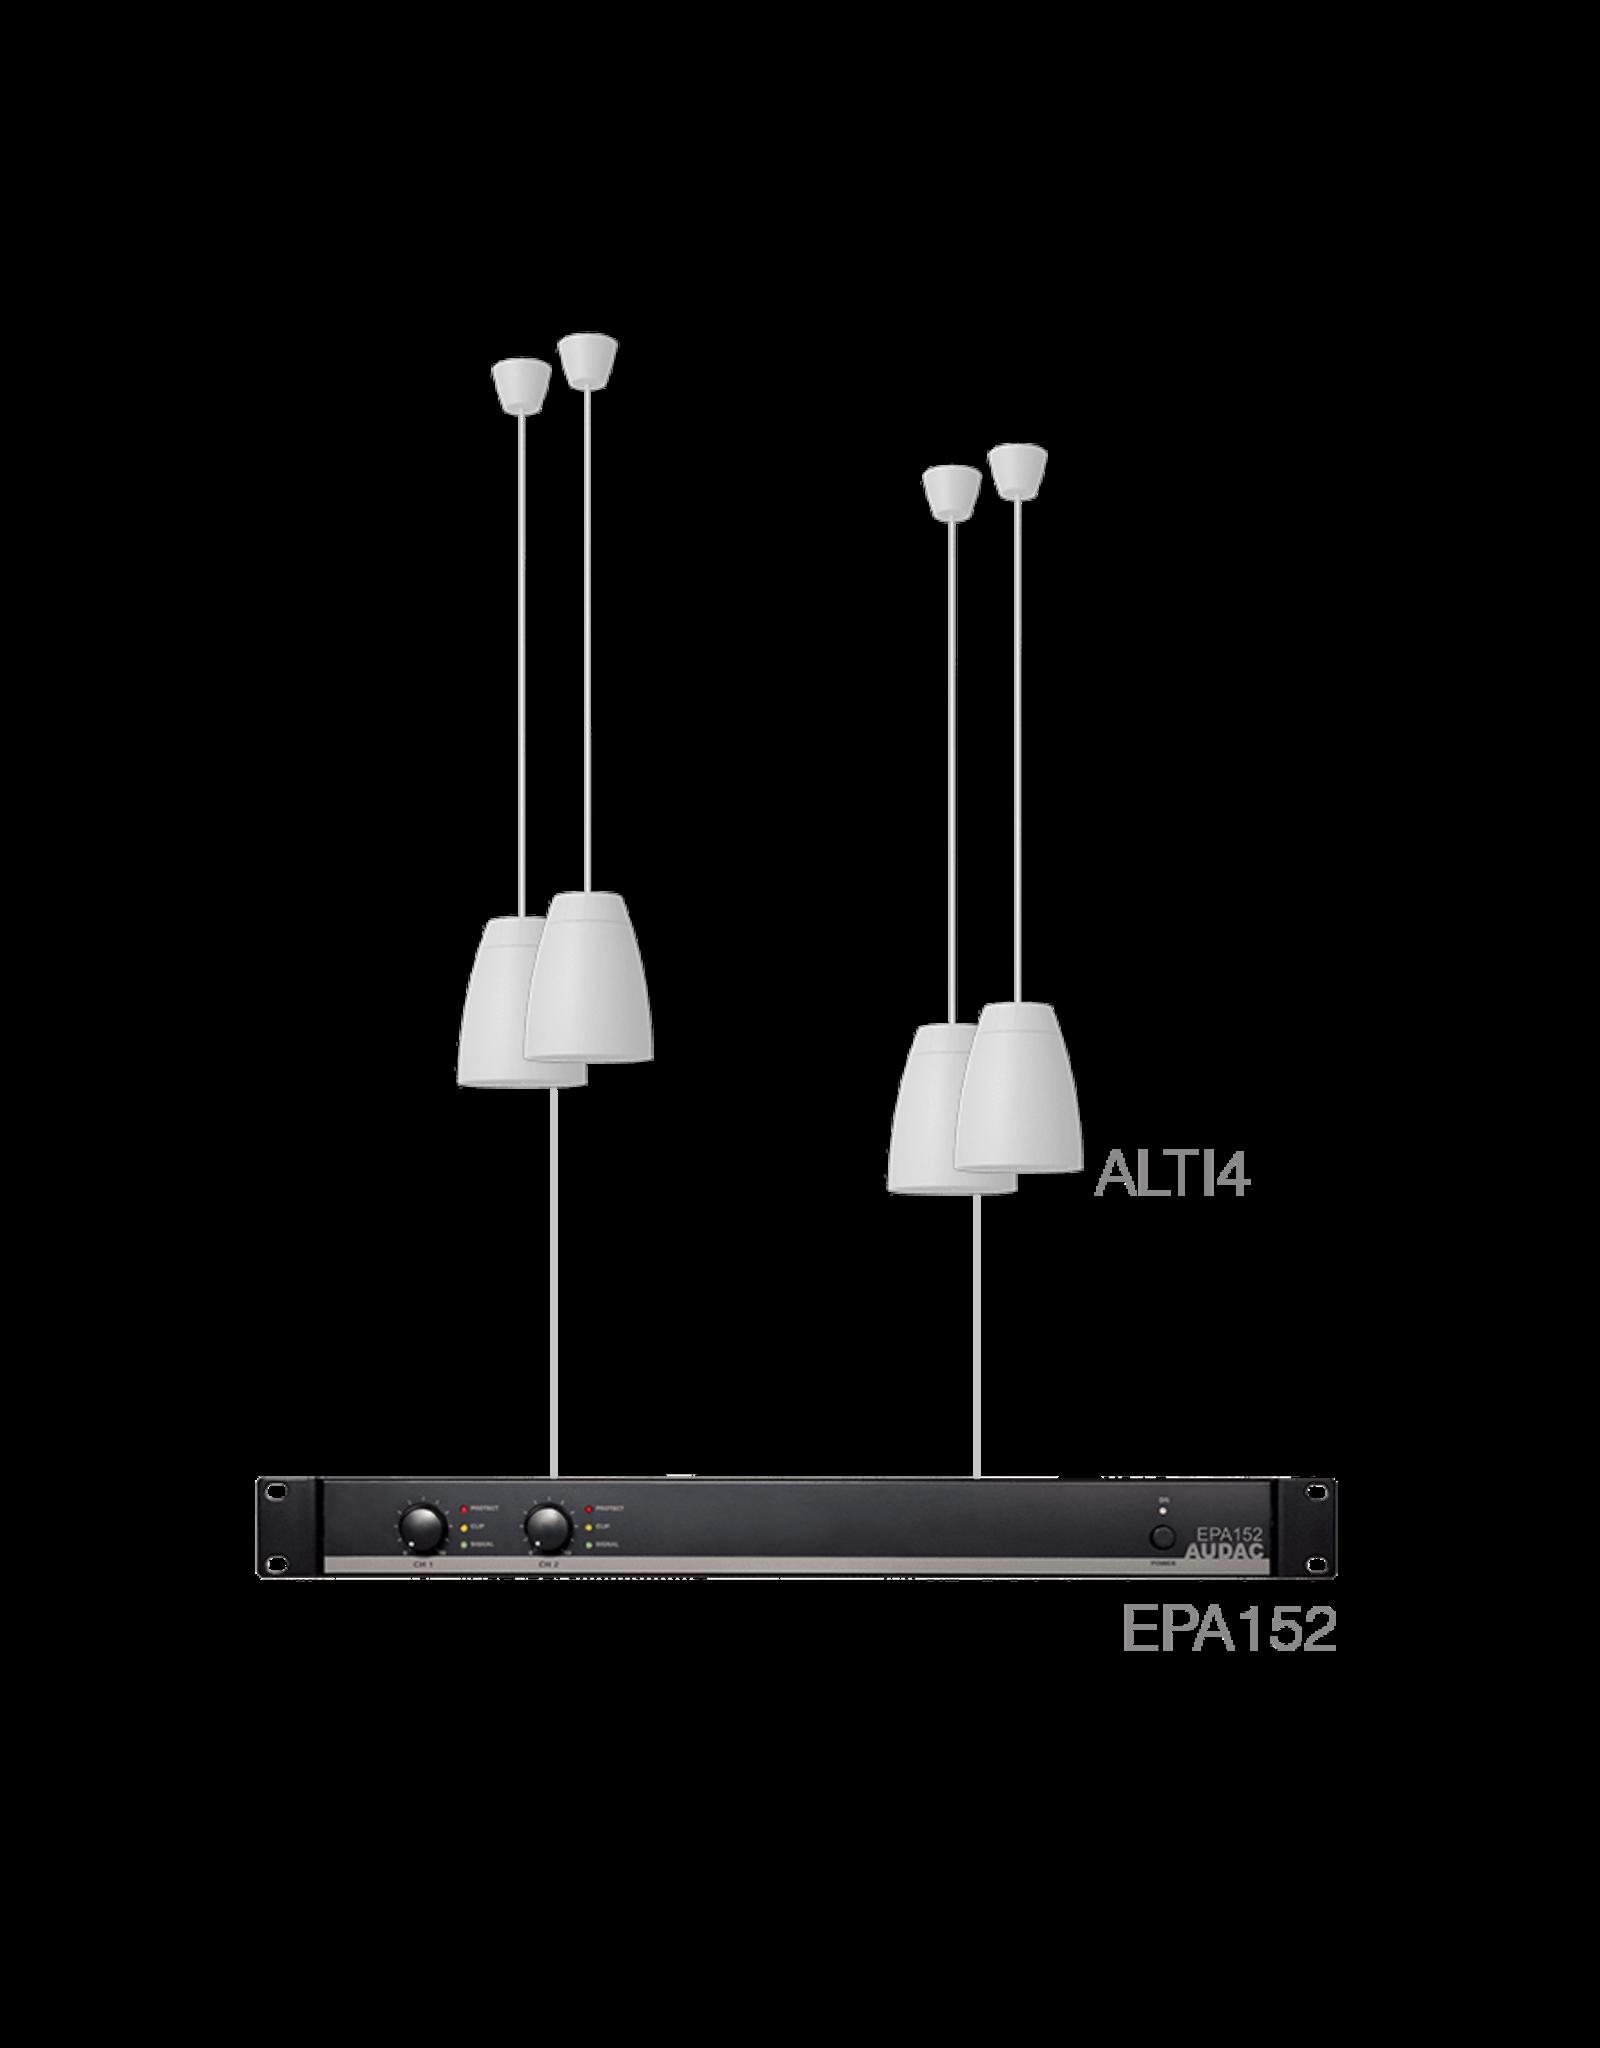 Audac 4 x ALTI4/W + EPA152 White